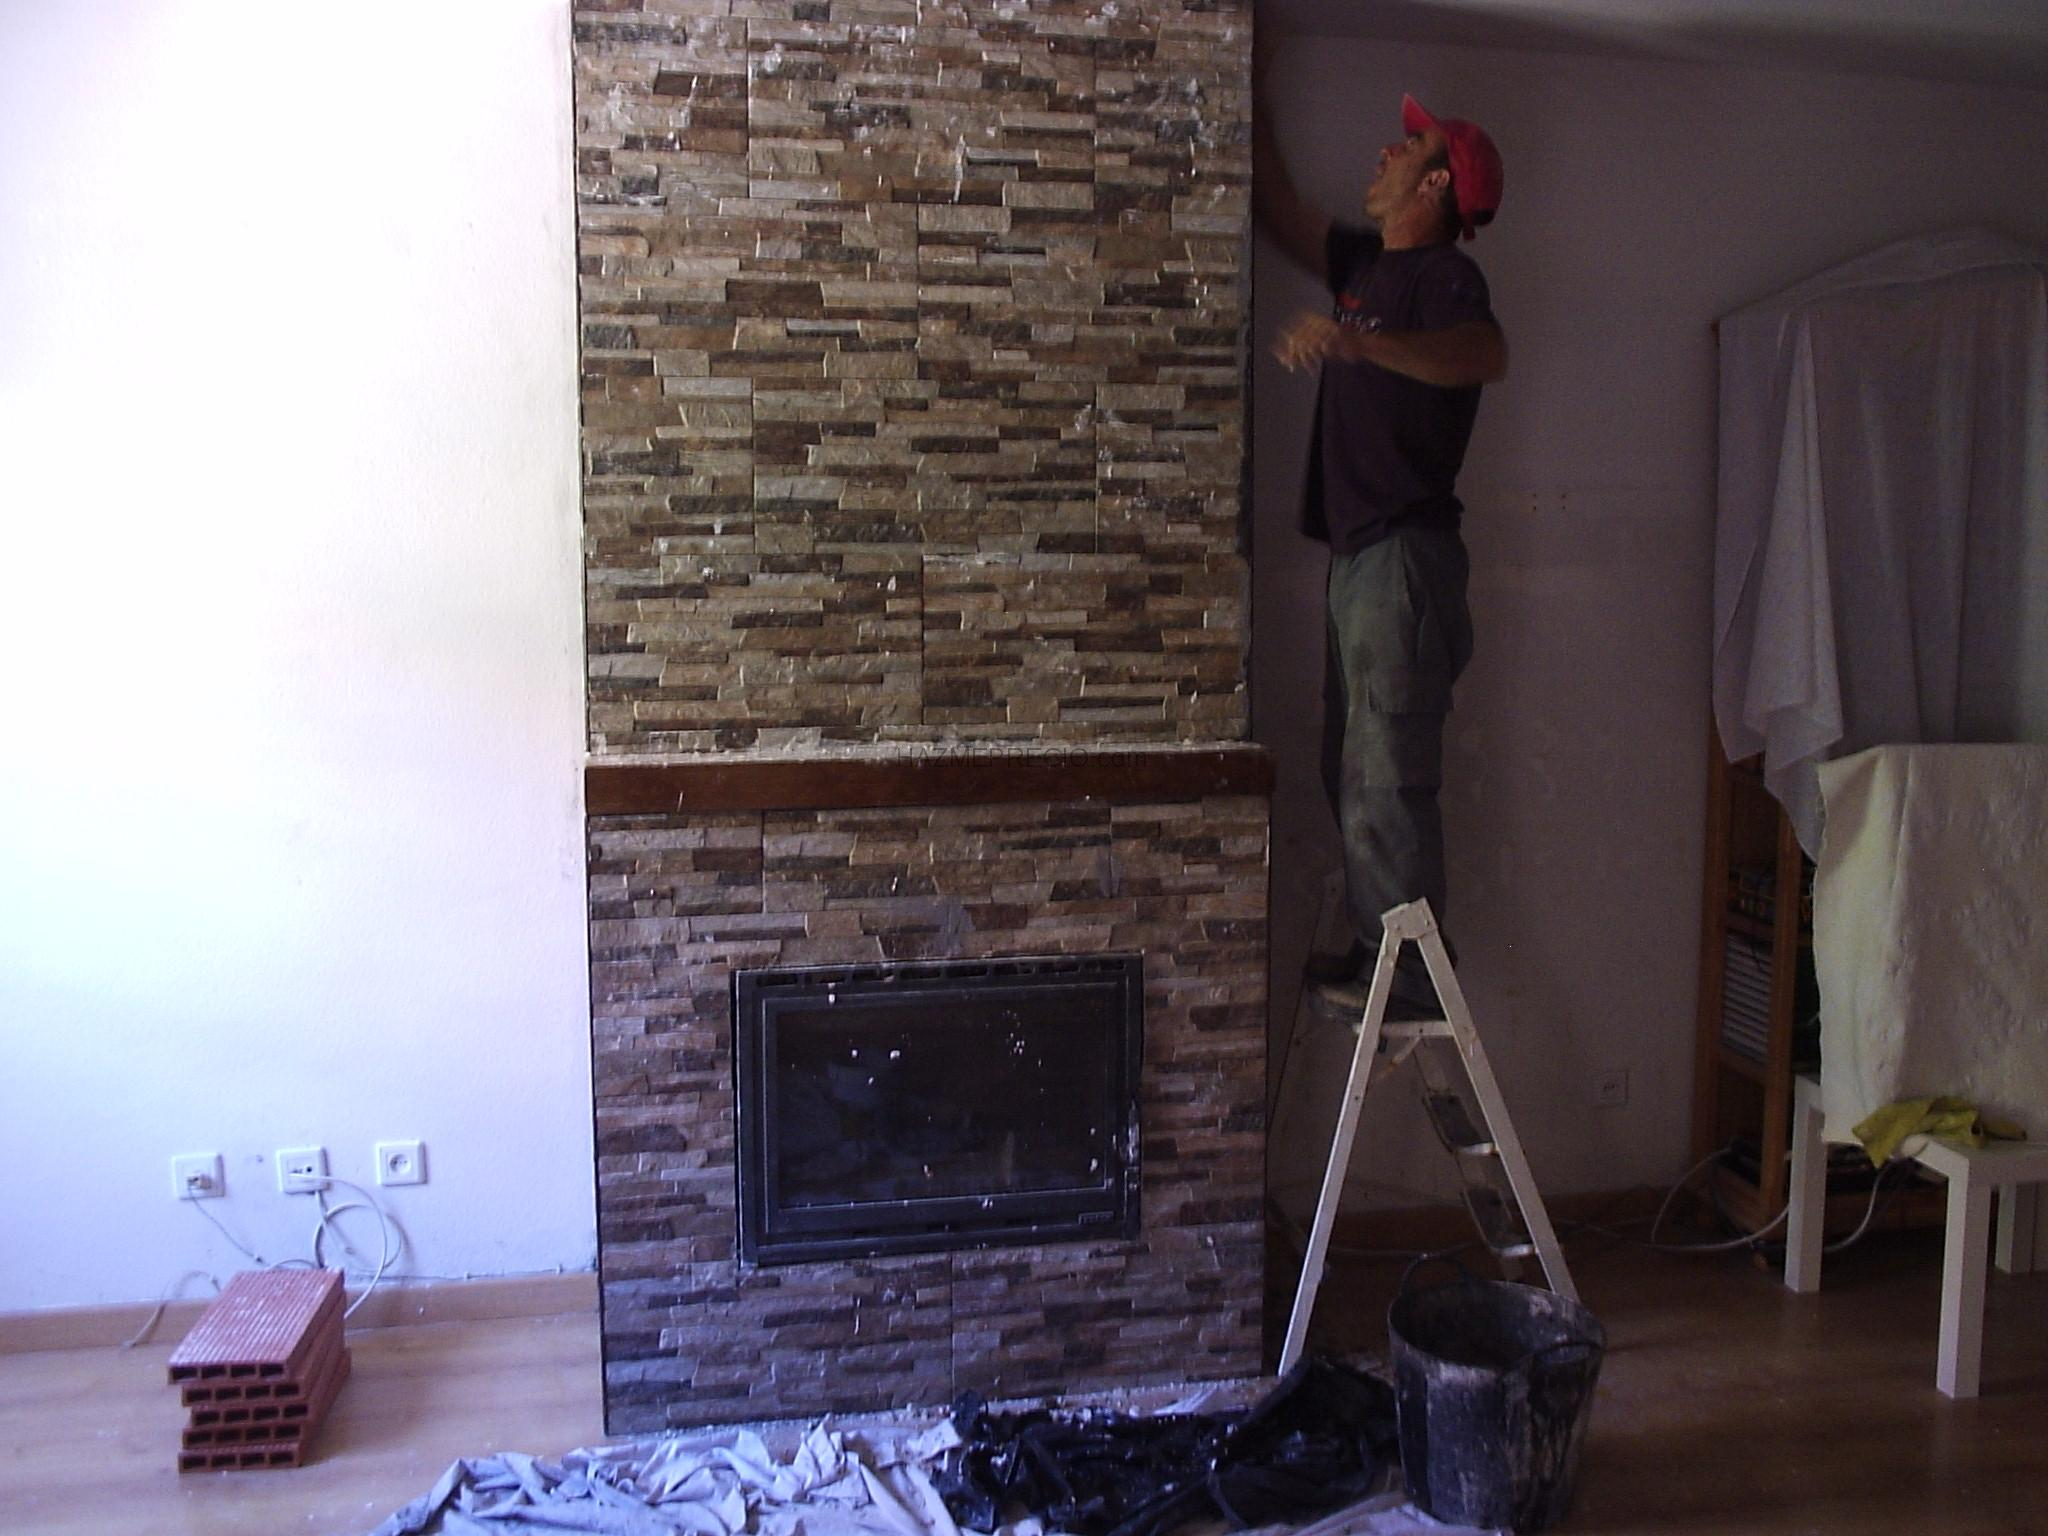 1000 images about chimeneas on pinterest fireplaces - Chimeneas de obra ...